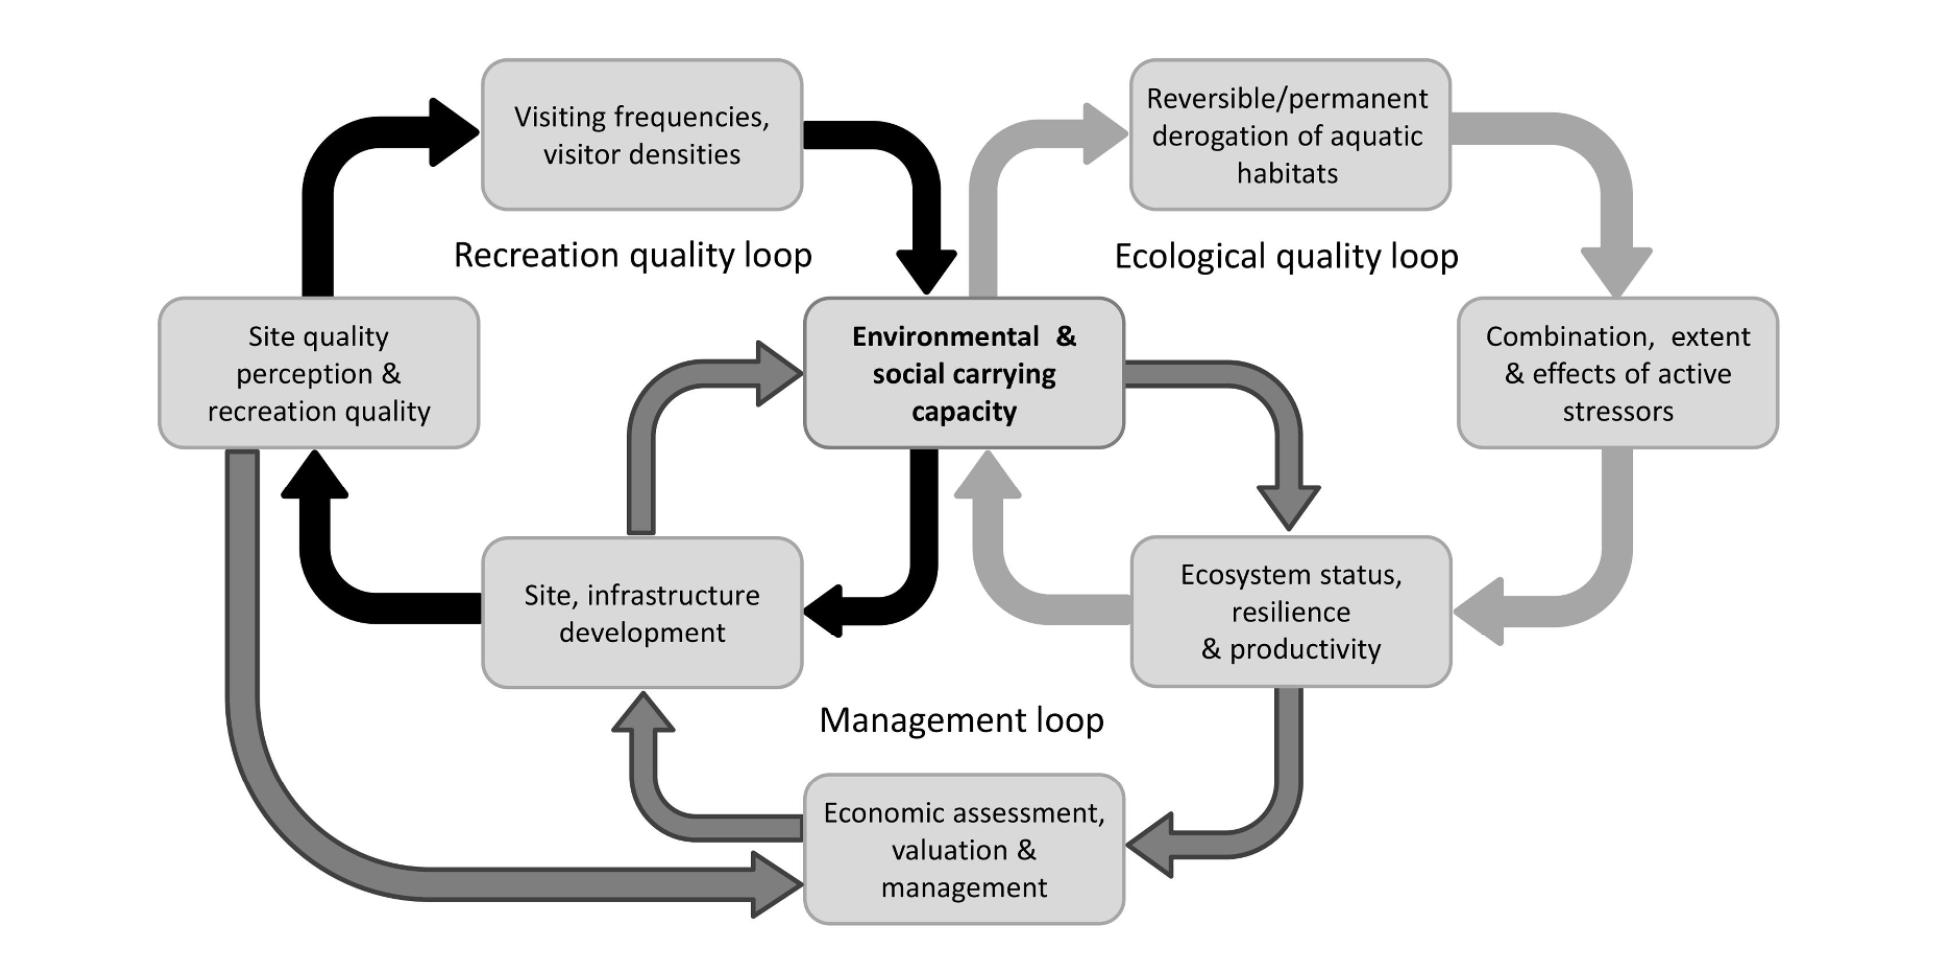 Managing Multiple Pressures From Recreational Activities